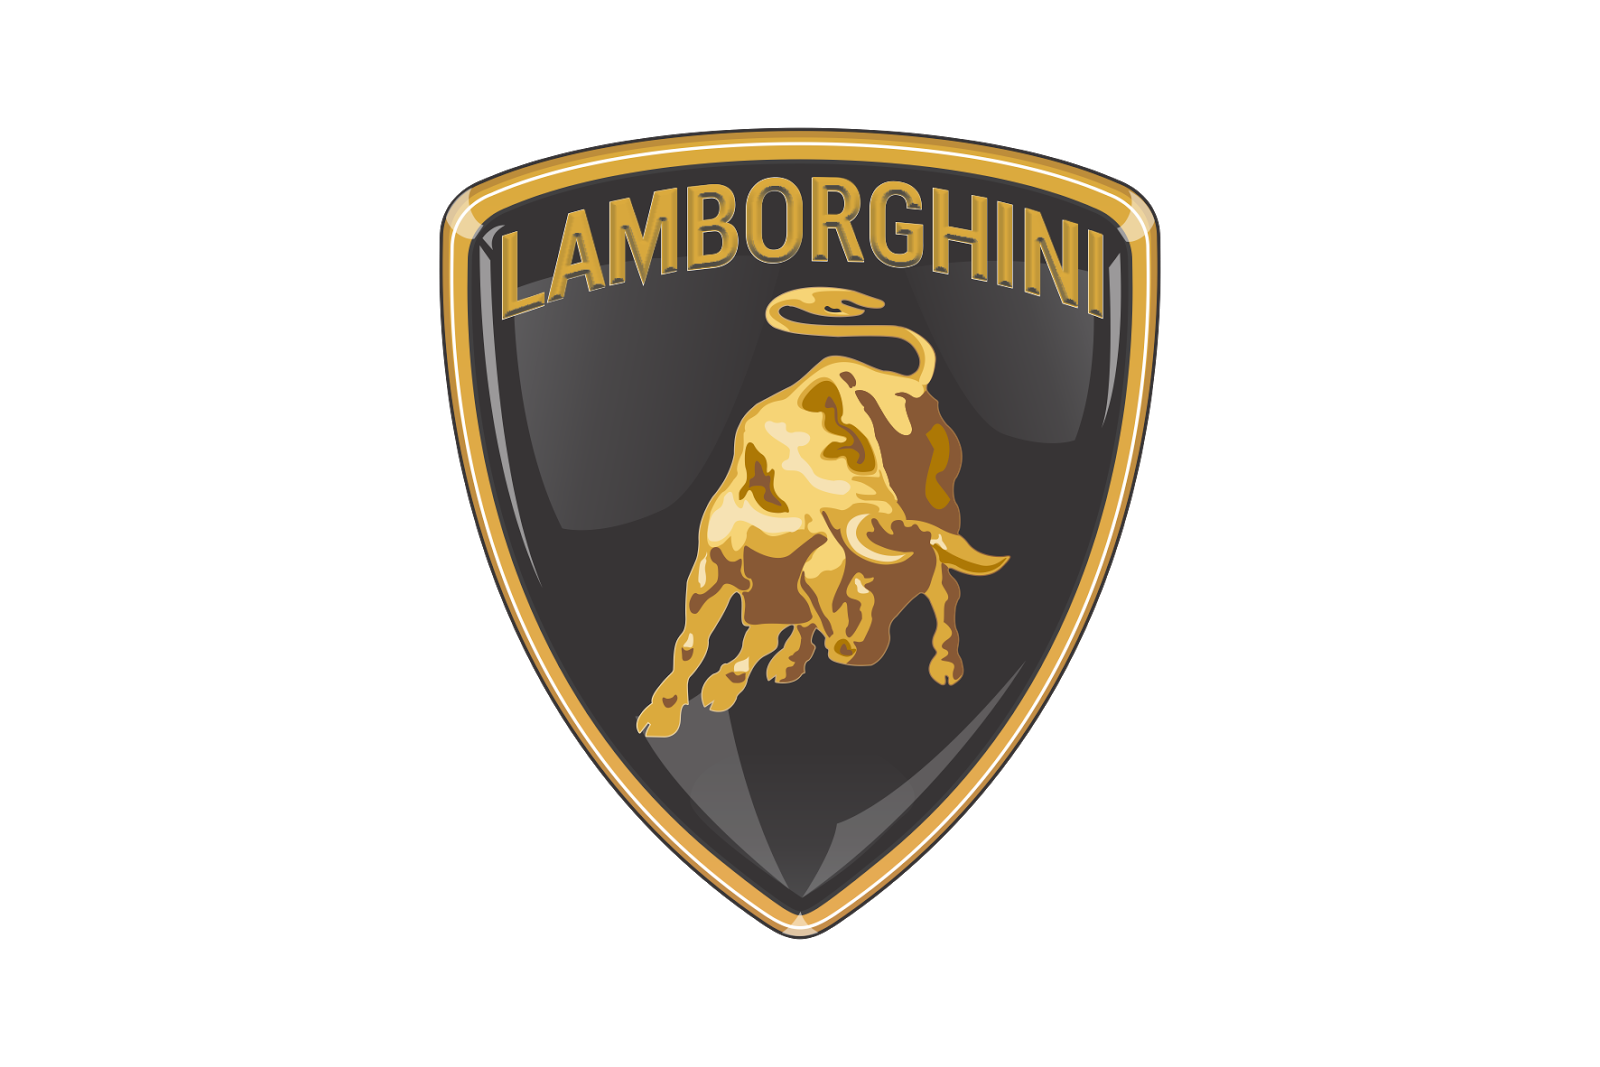 логотип ламборджини в векторе